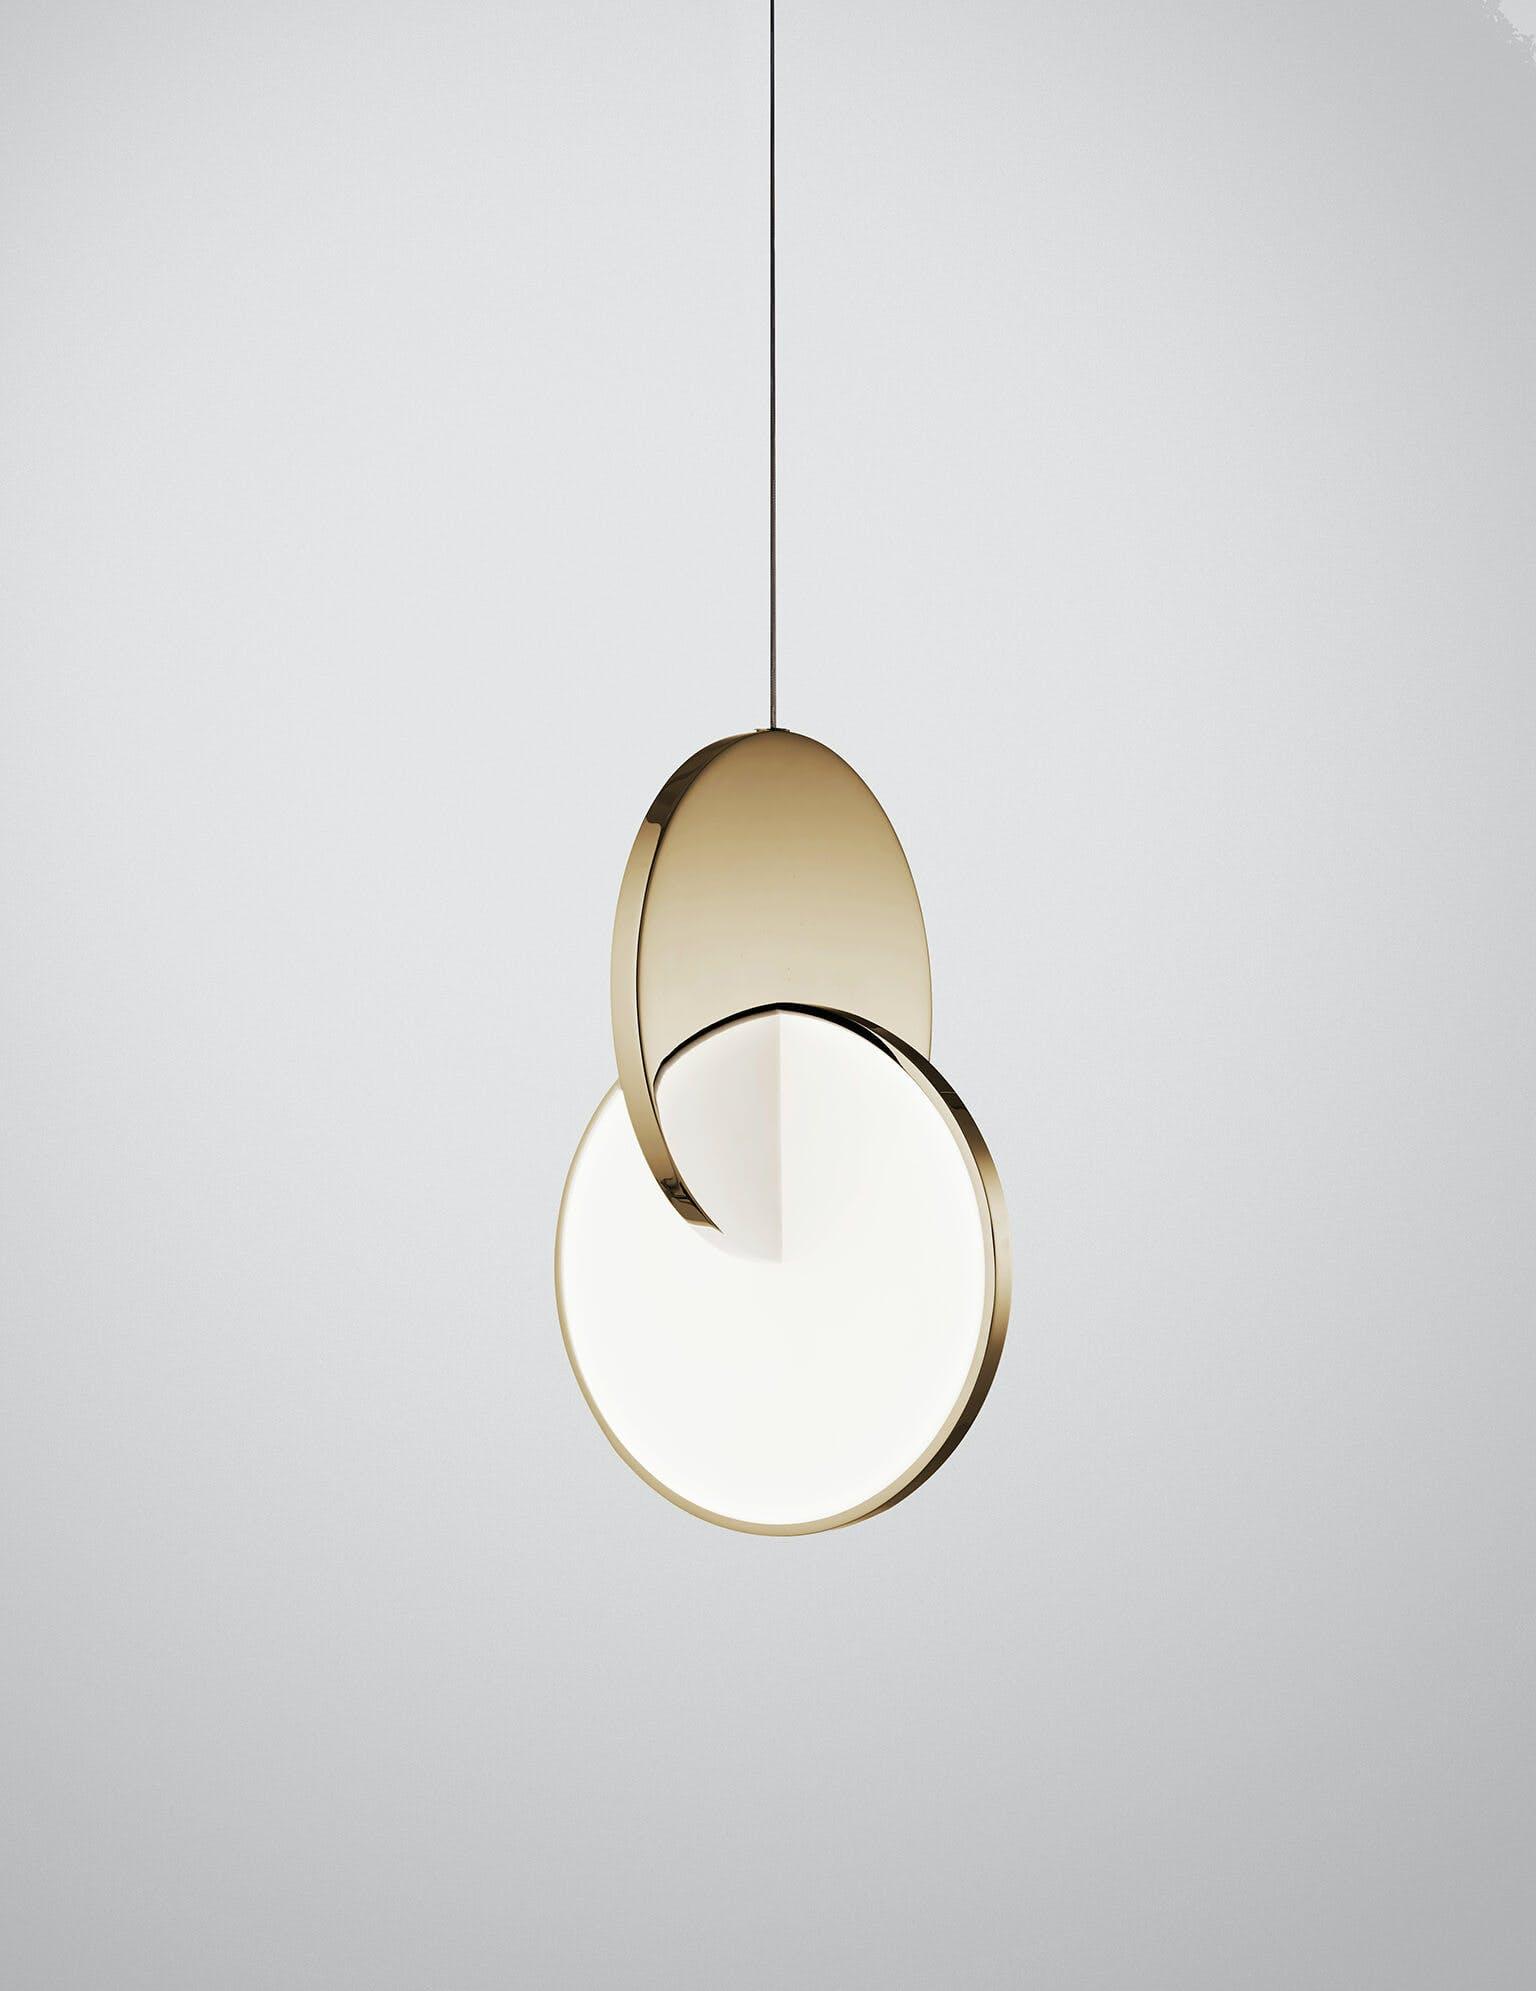 Lee-broom-gold-eclipse-pendant-light-haute-living